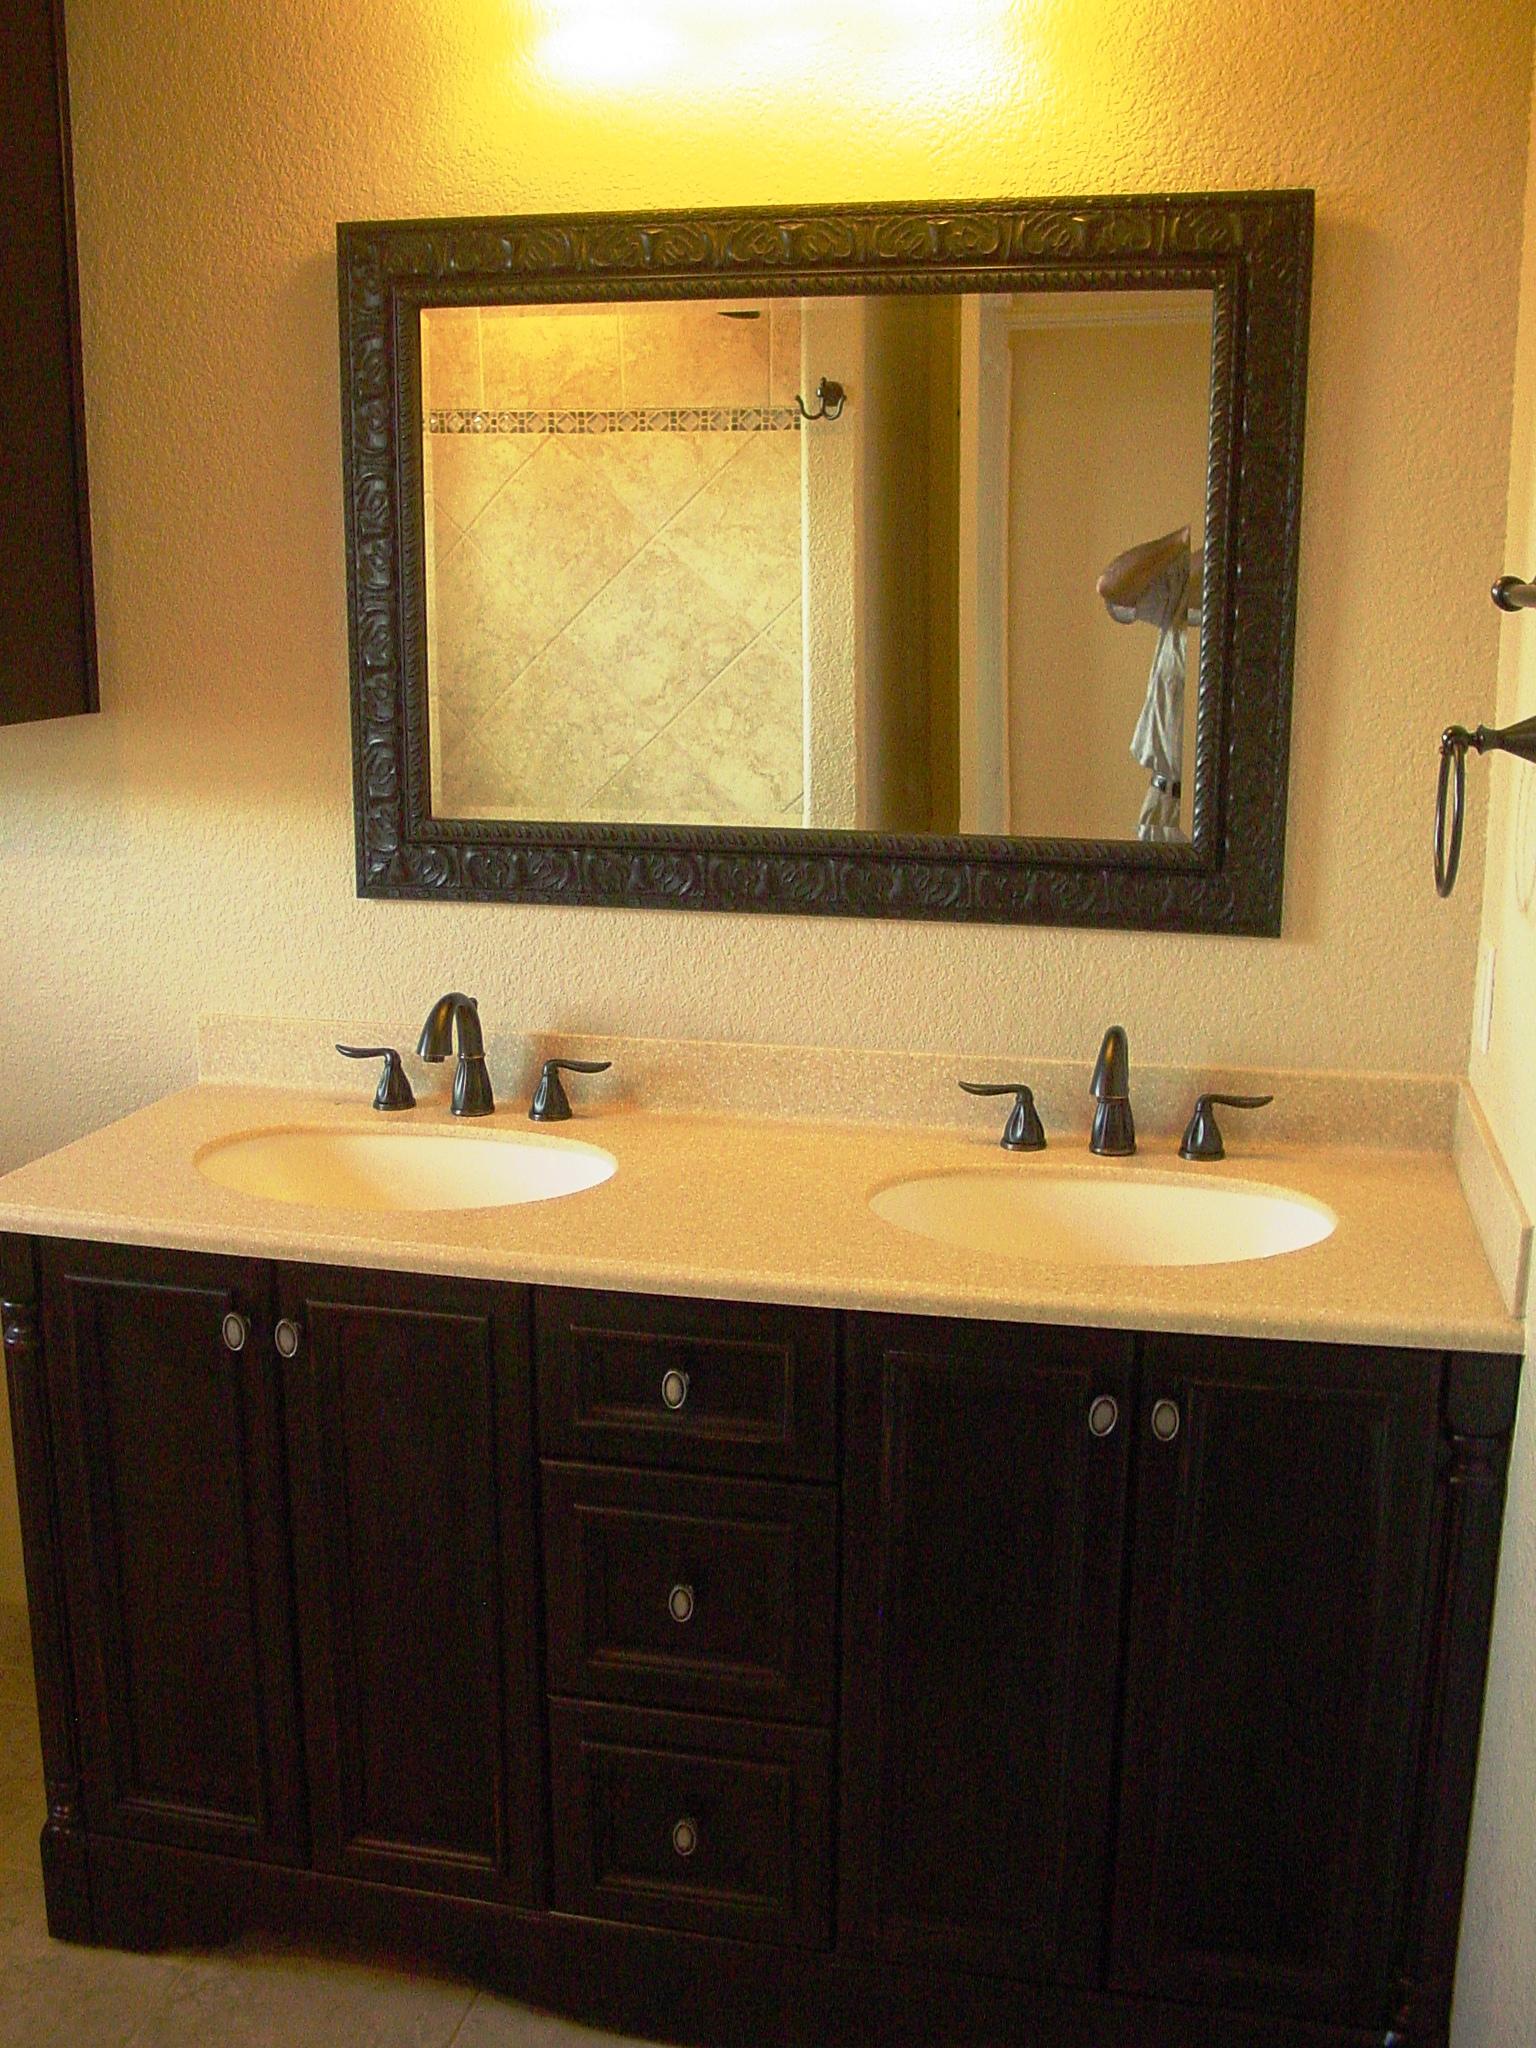 411 HH - Complete, Interior, Bath 2,2.JPG